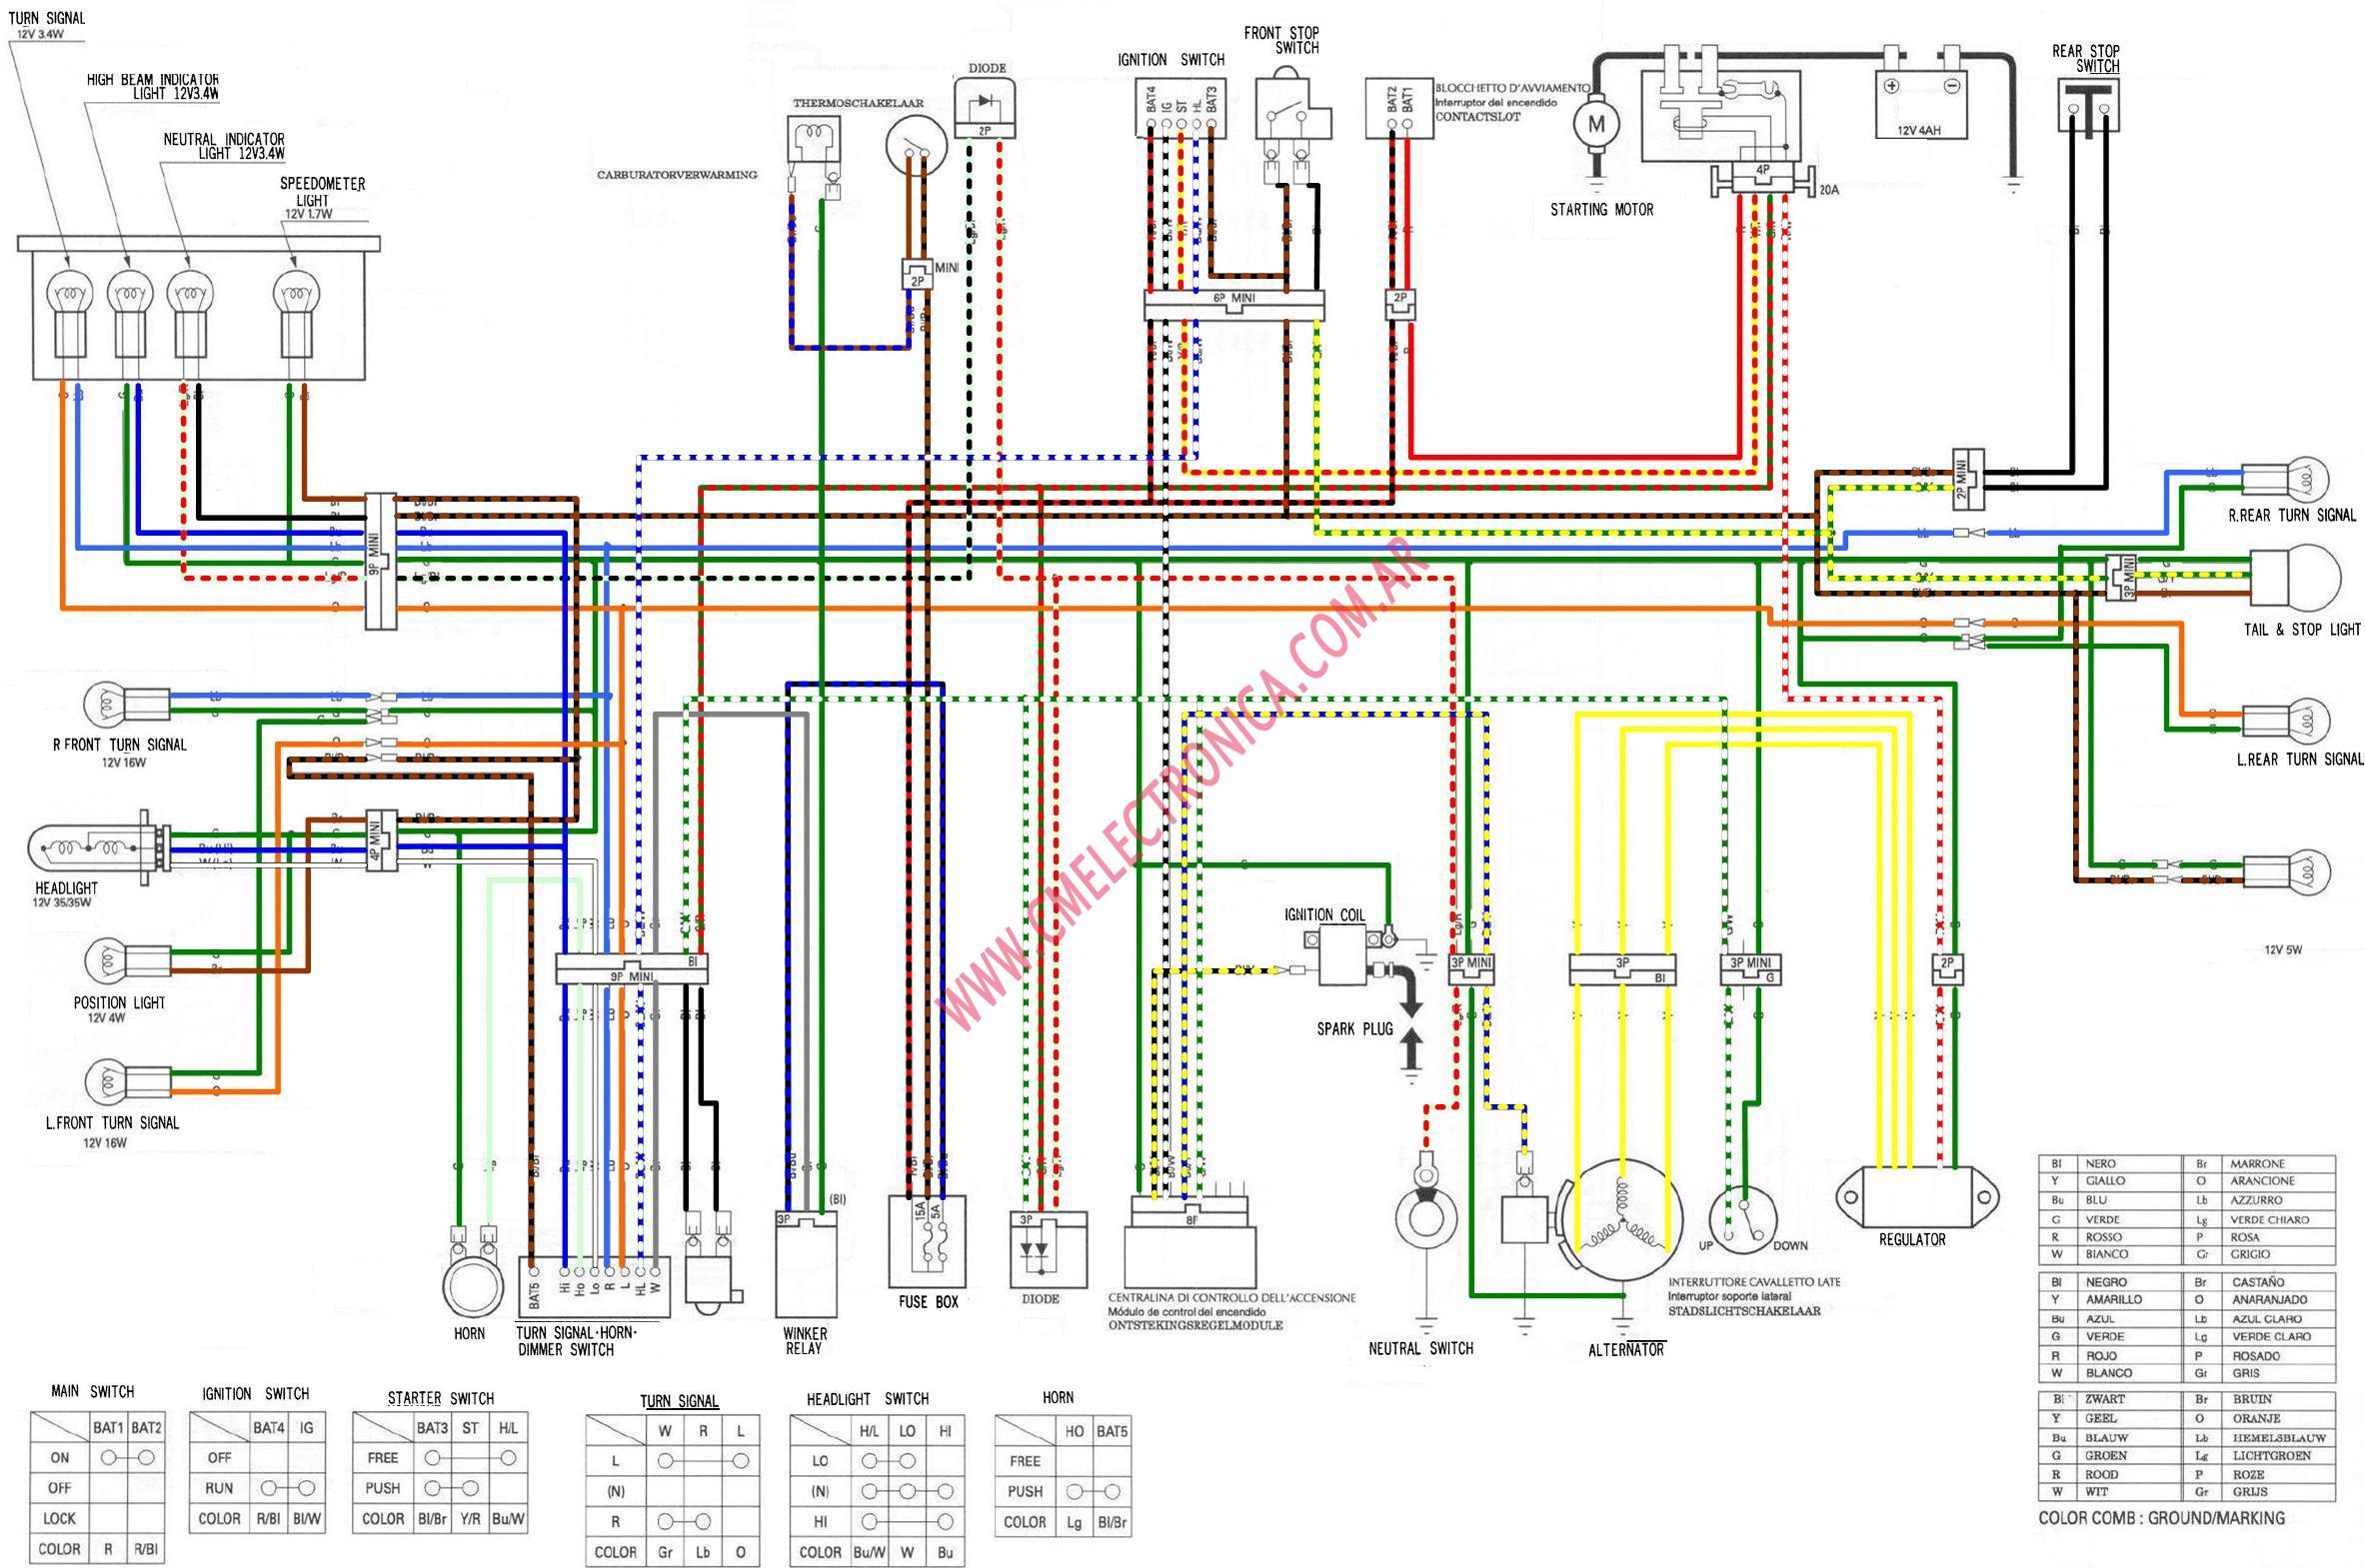 0bd honda nsr 125 r wiring diagram wiring resources nsr 125 rr honda nsr 125 r wiring diagram #2